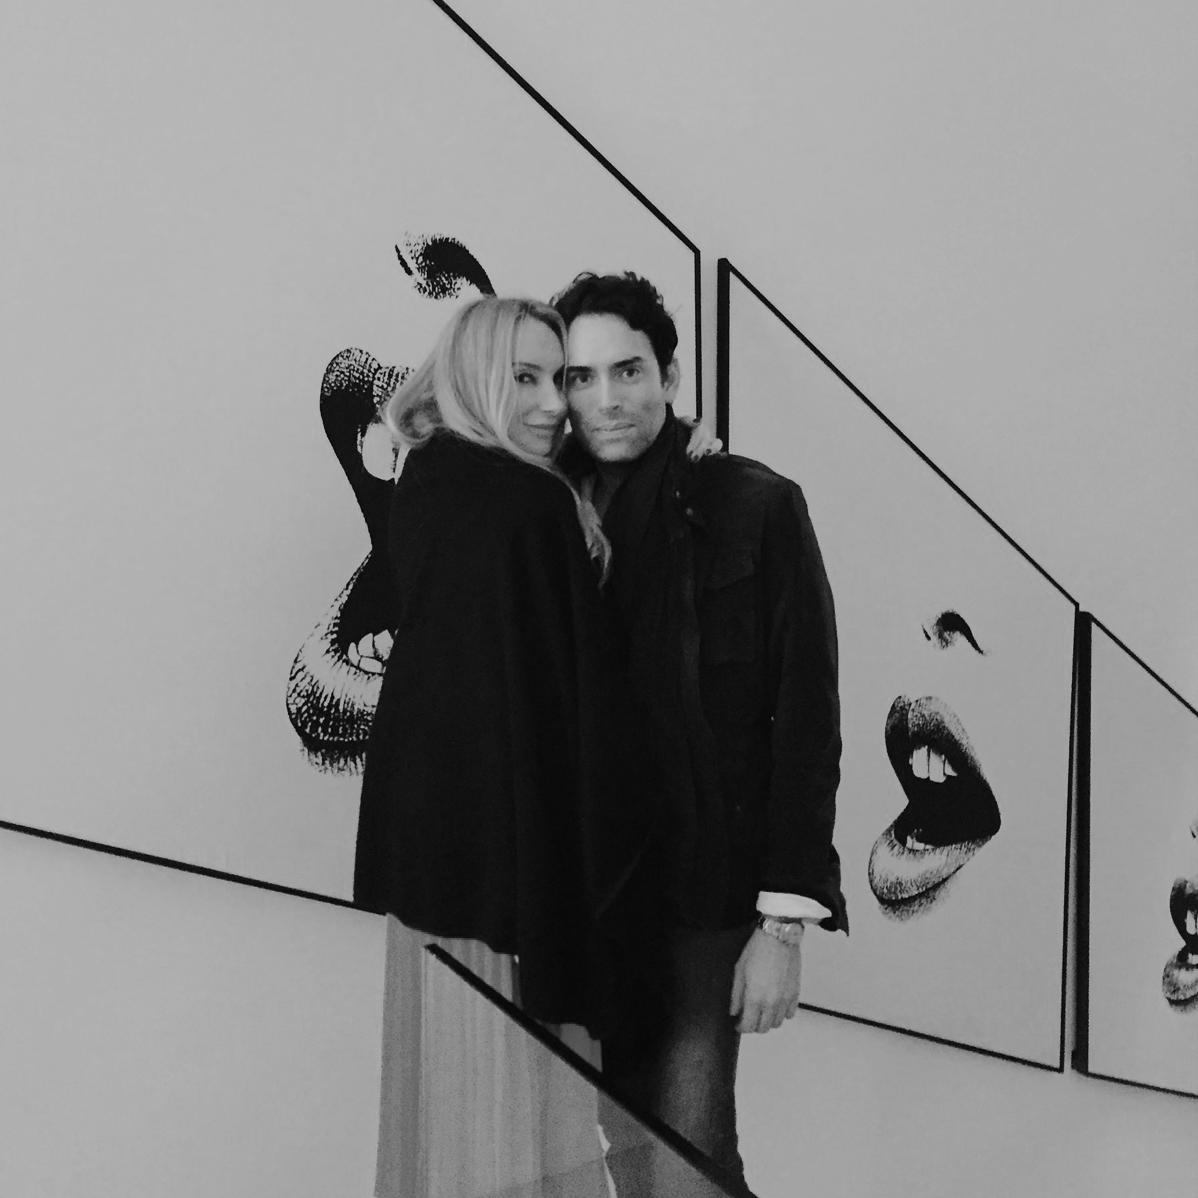 Nicole Fuller and her husband, artist Alexander Yulish